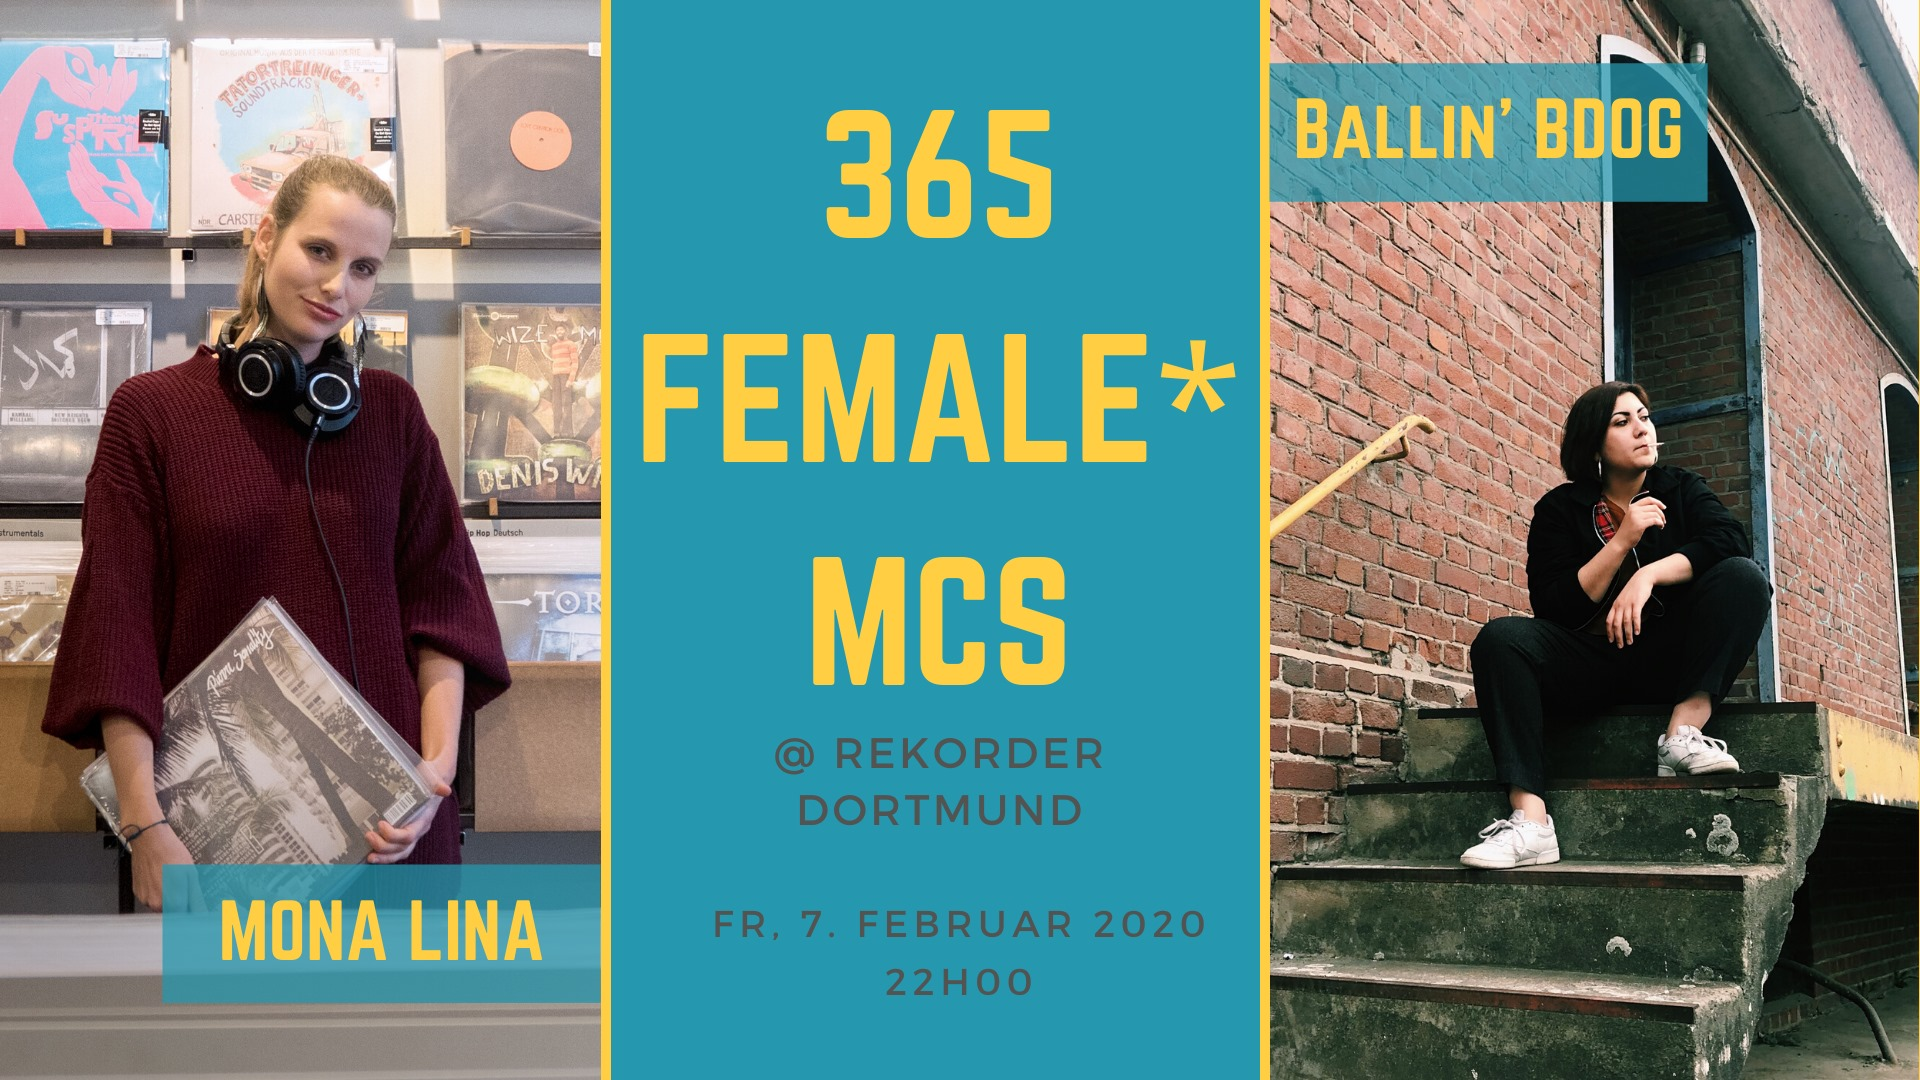 365 Female* MCs - Party